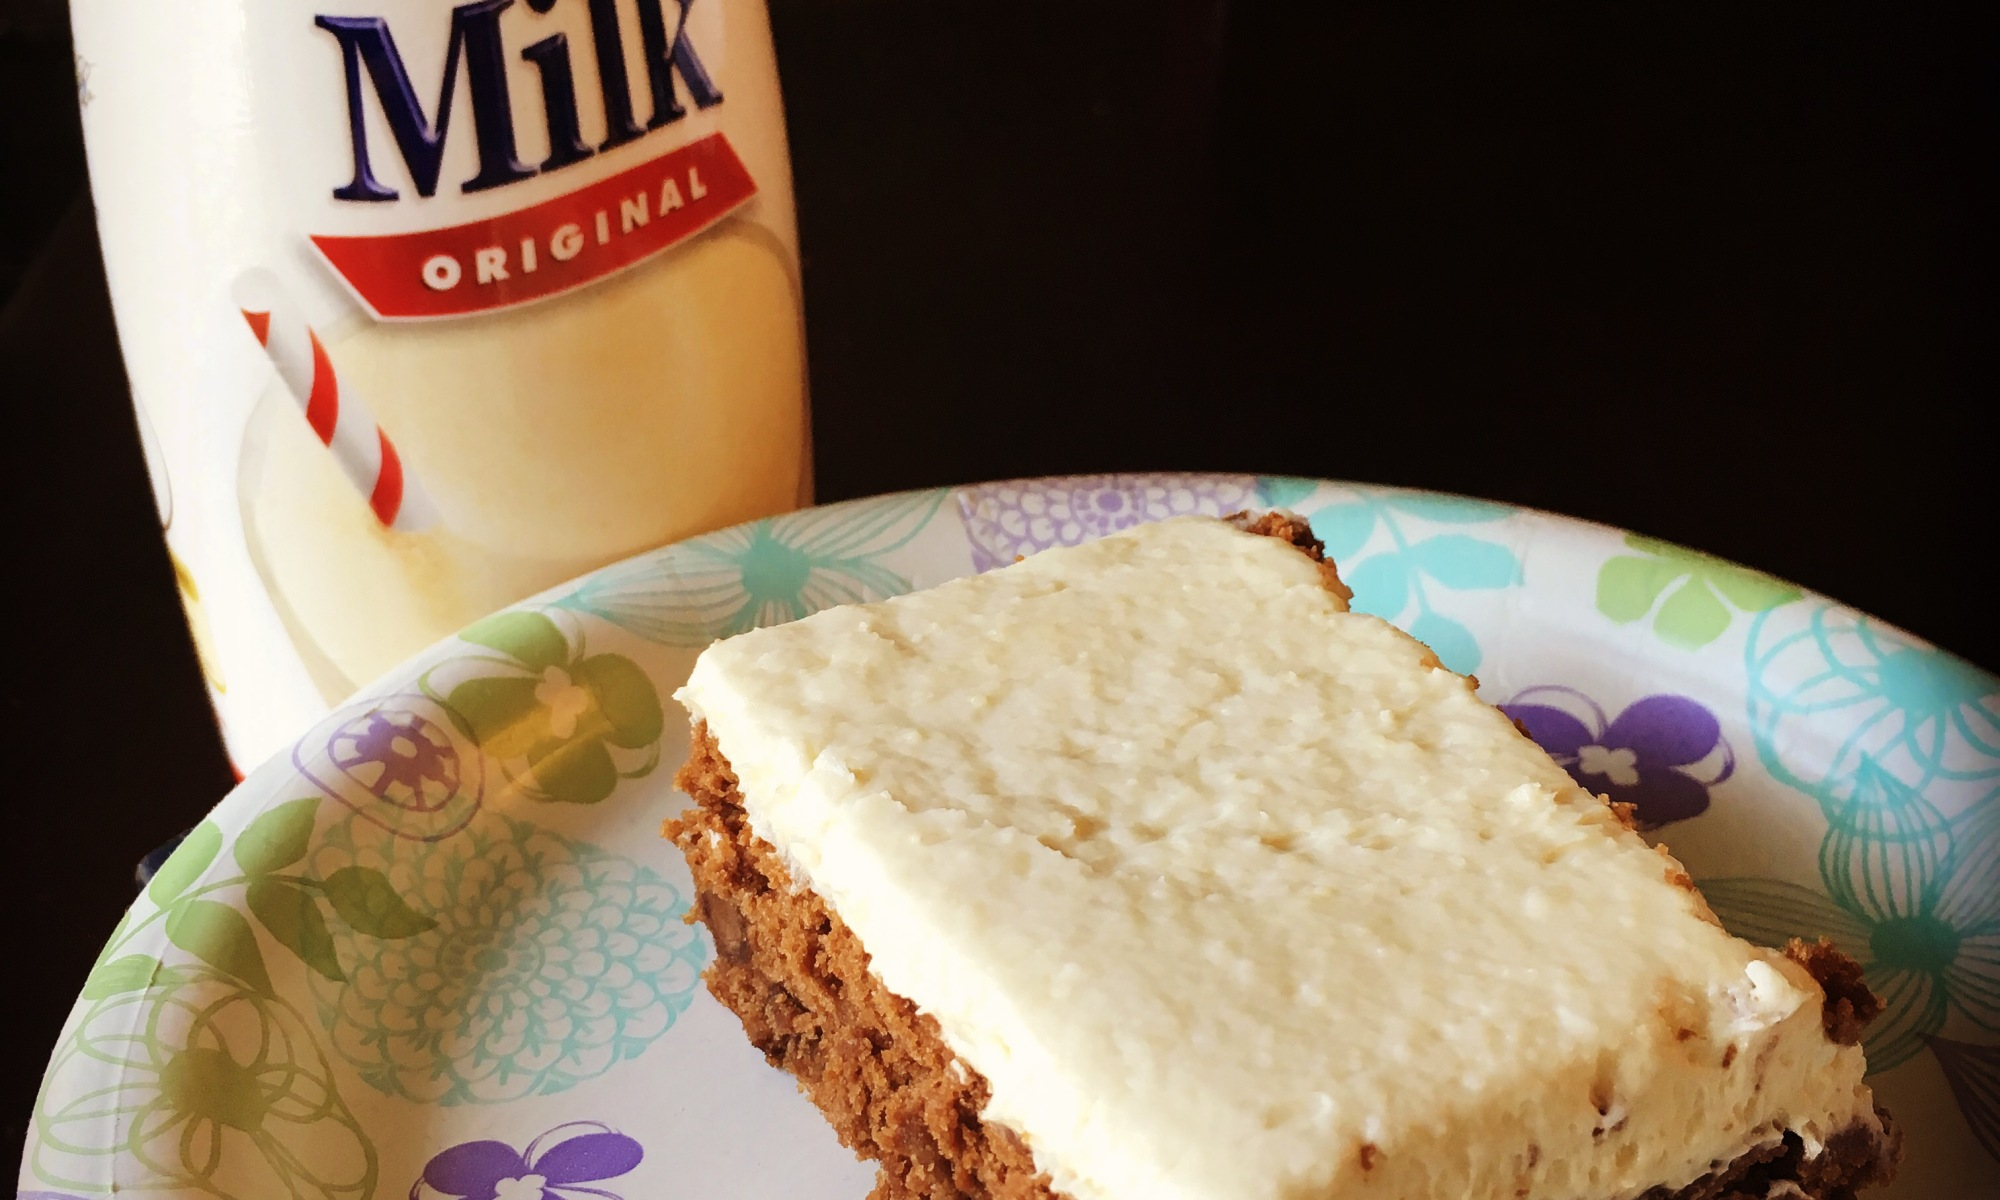 Chocolate malt cake with vanilla malted milk frosting